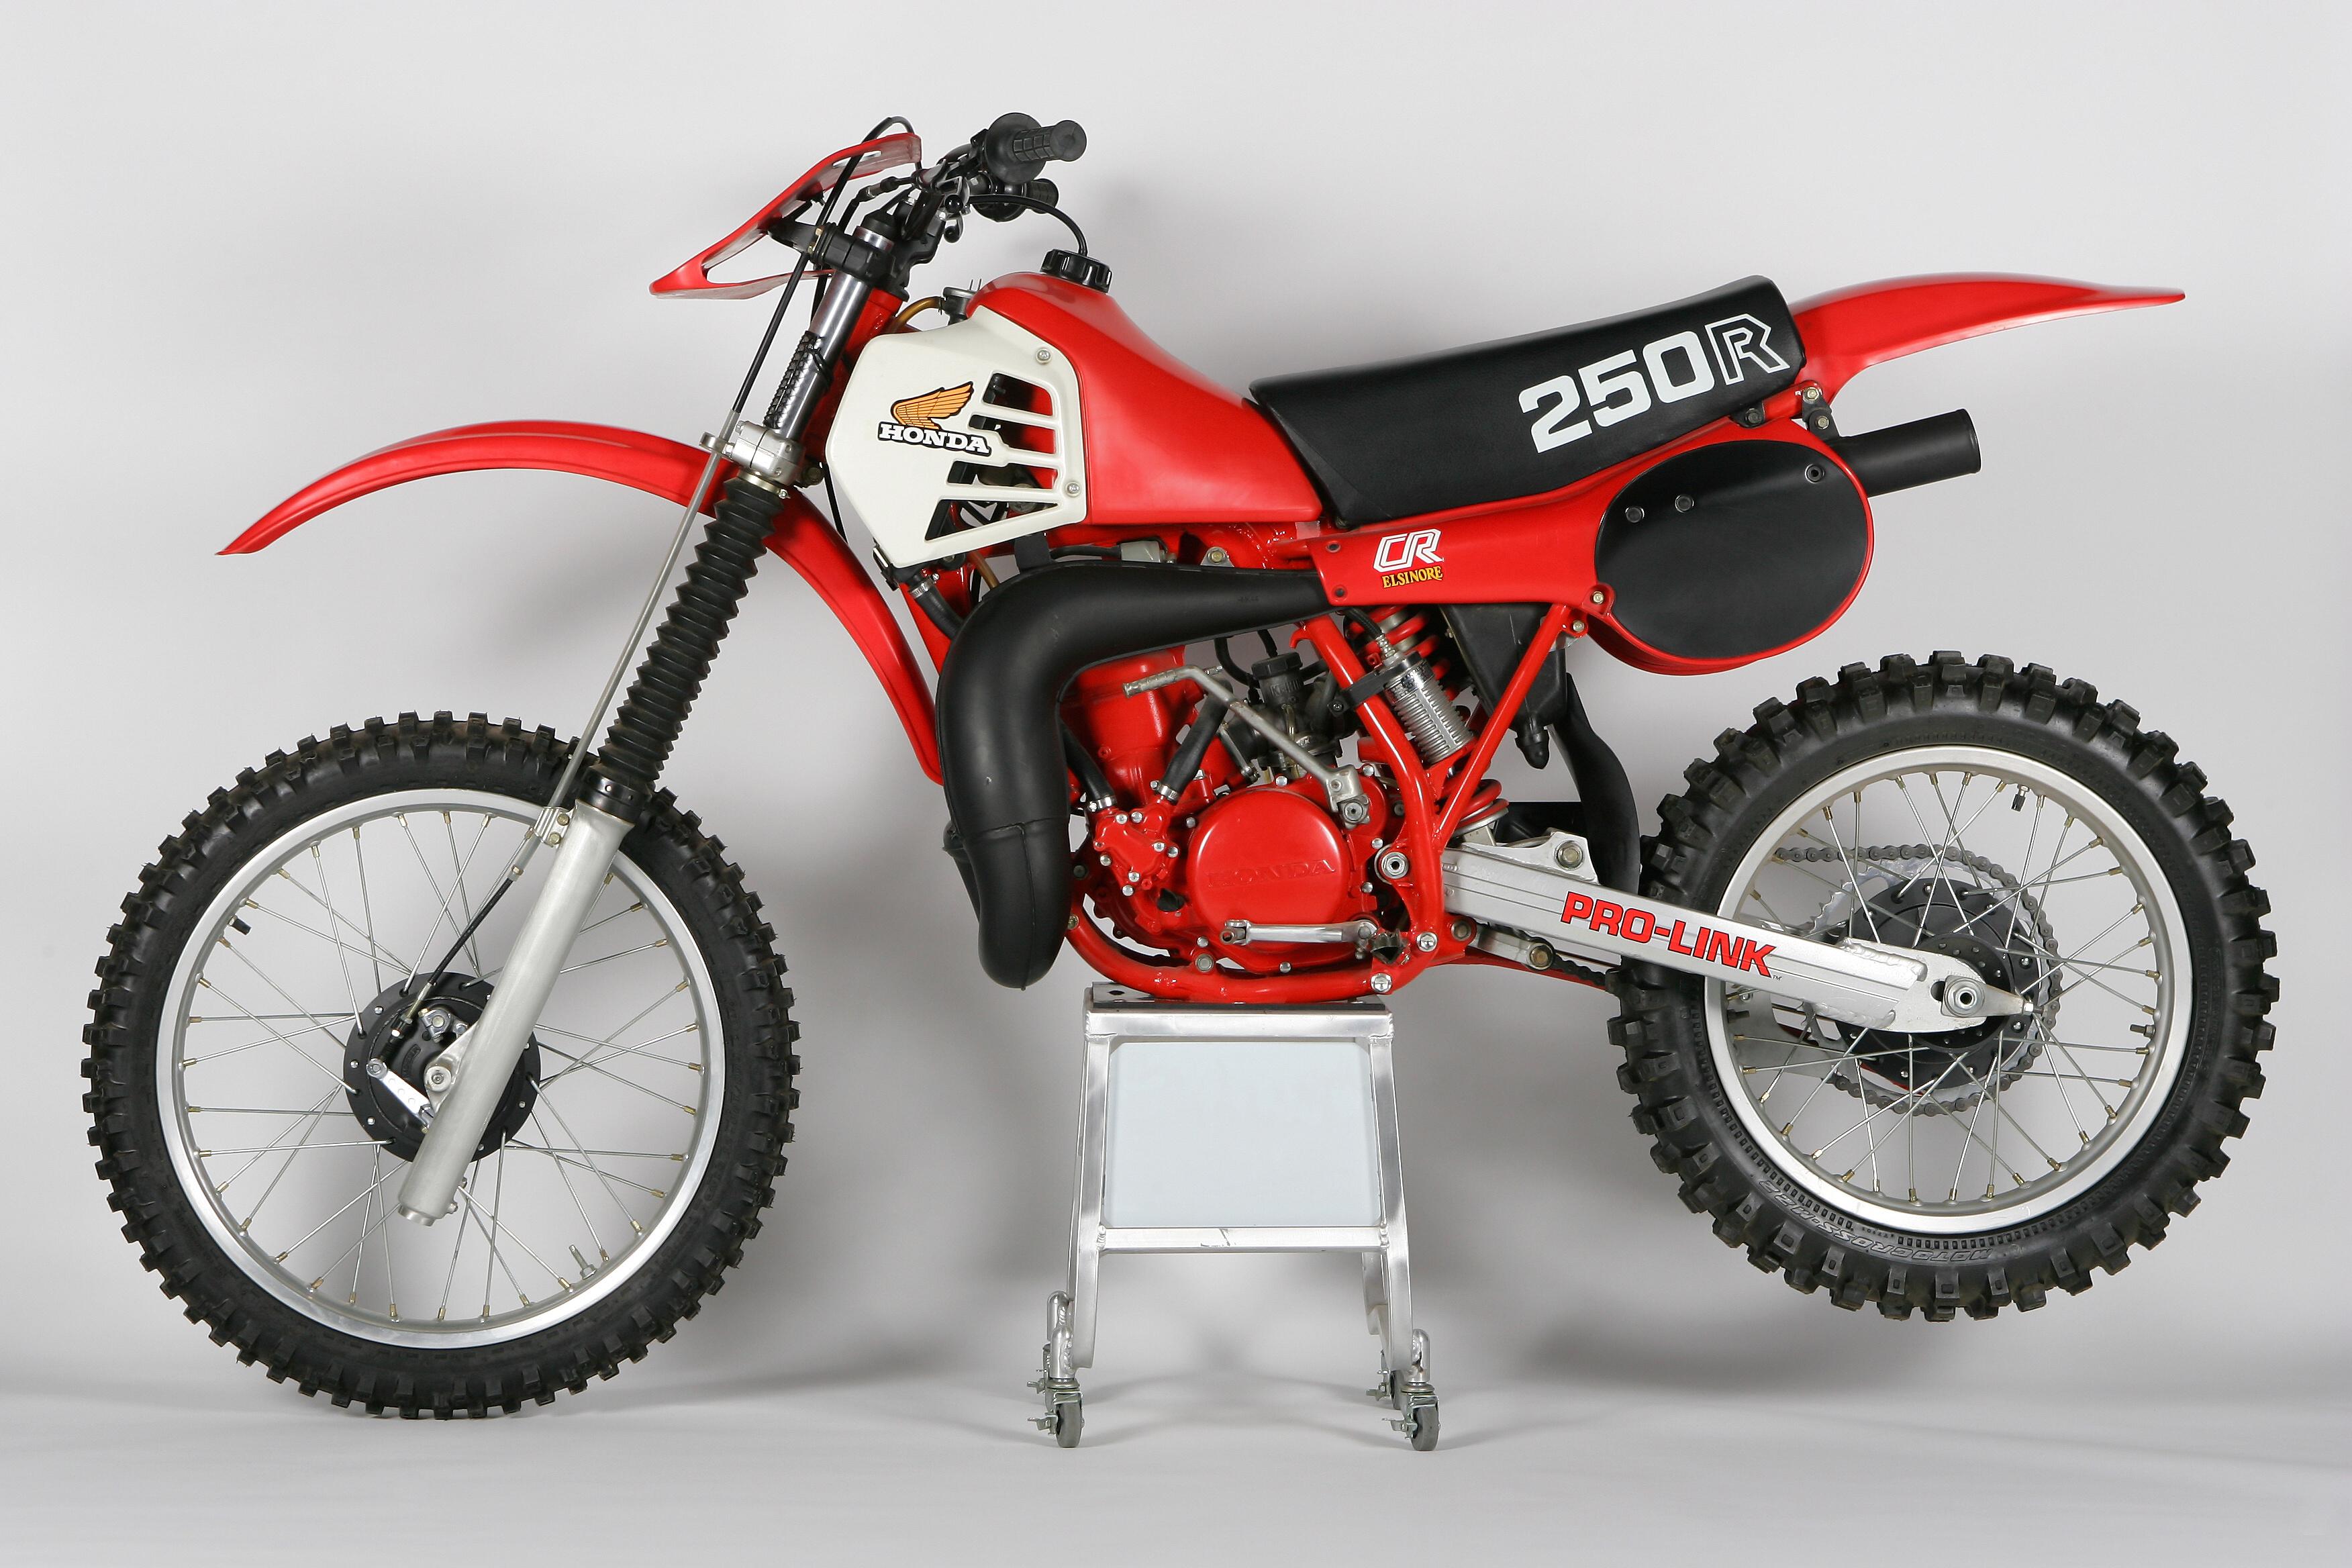 Honda cr250r купить запчасти